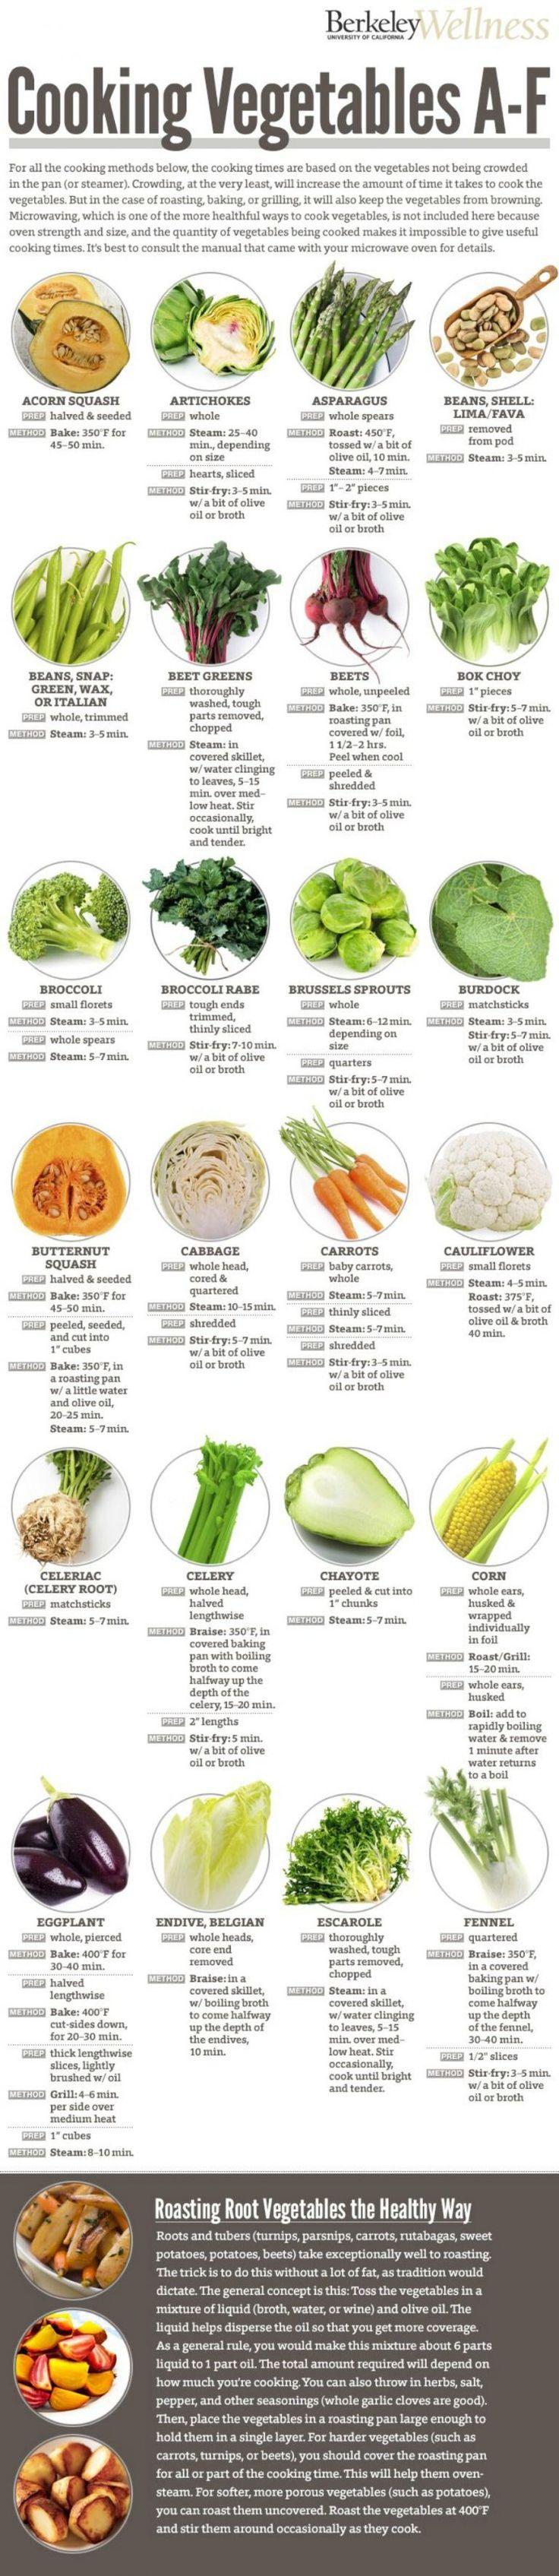 best 25 cooking tools ideas on pinterest beginner cooking he